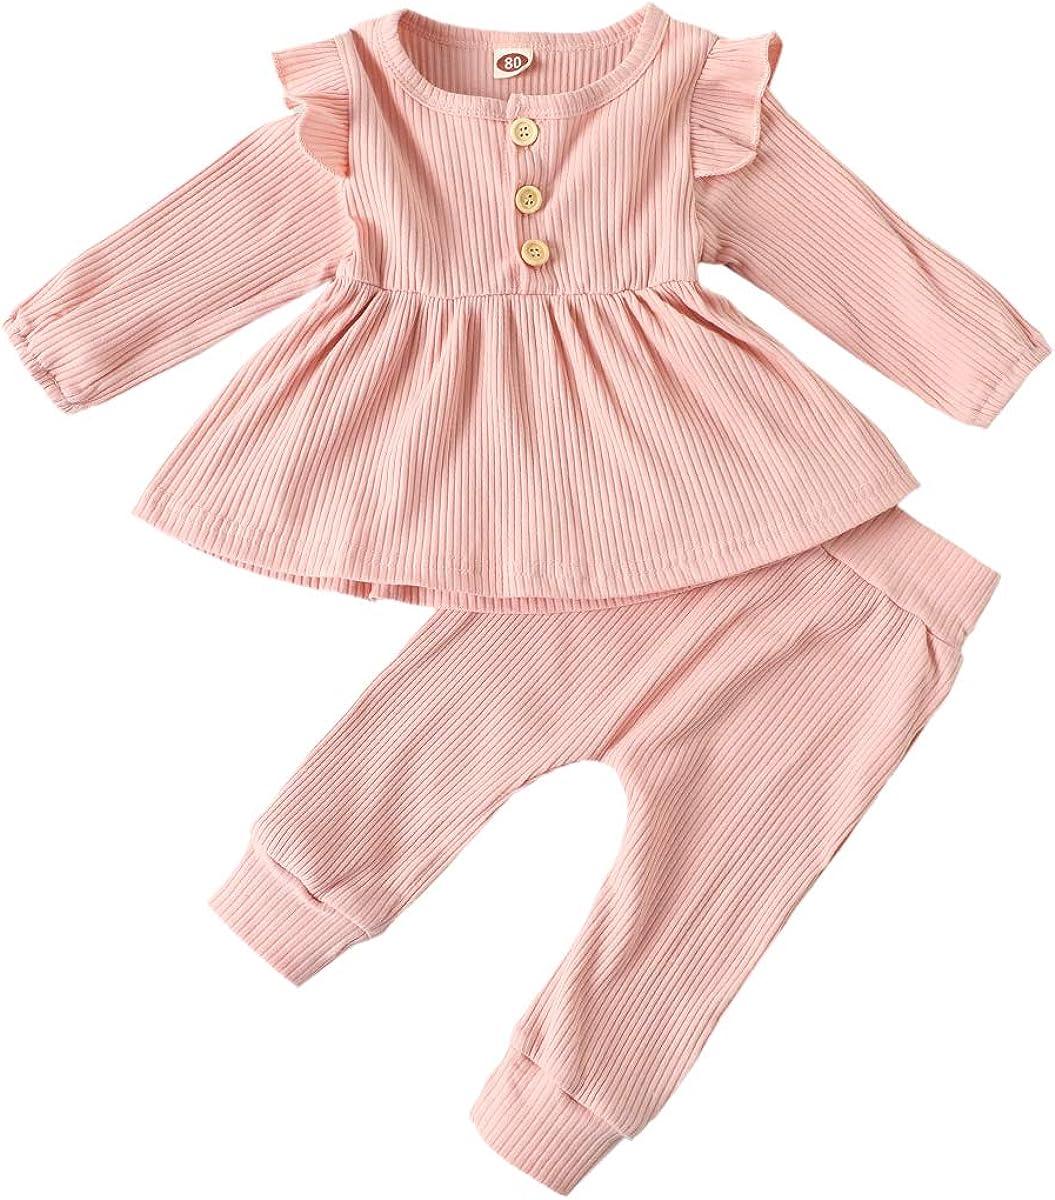 SAM PERKINS Newborn Baby Girls Knit Cotton Fall Winter Clothes Toddler Kids Ruffle Shirt Tee + Pants 2Pcs Outfits